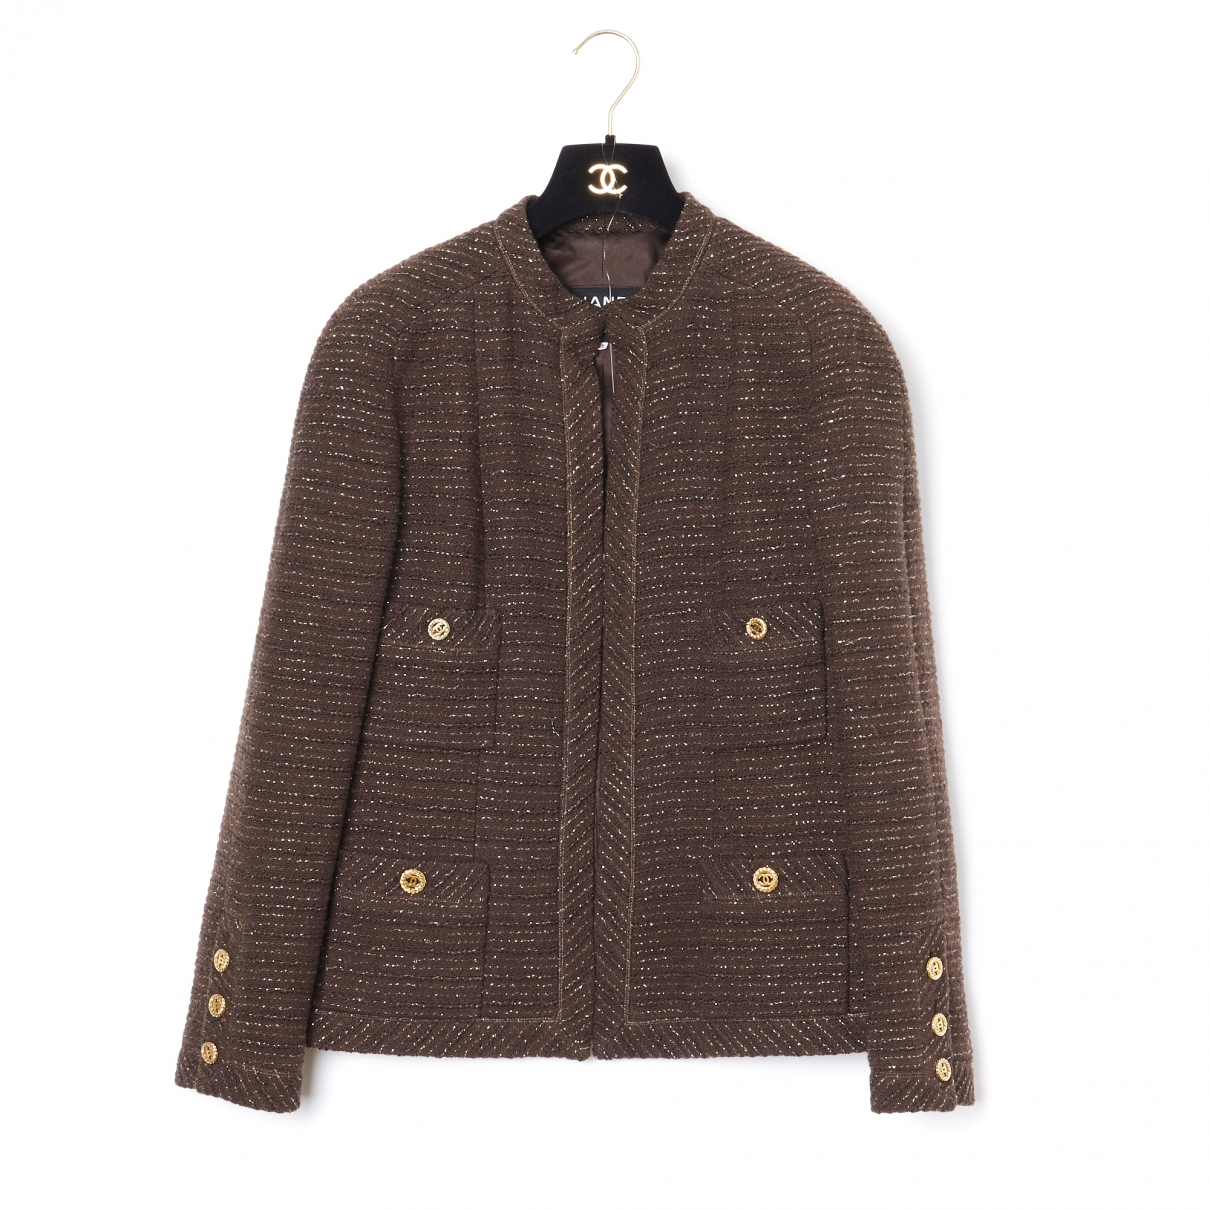 Chanel \N Brown Wool jacket for Women 40 FR